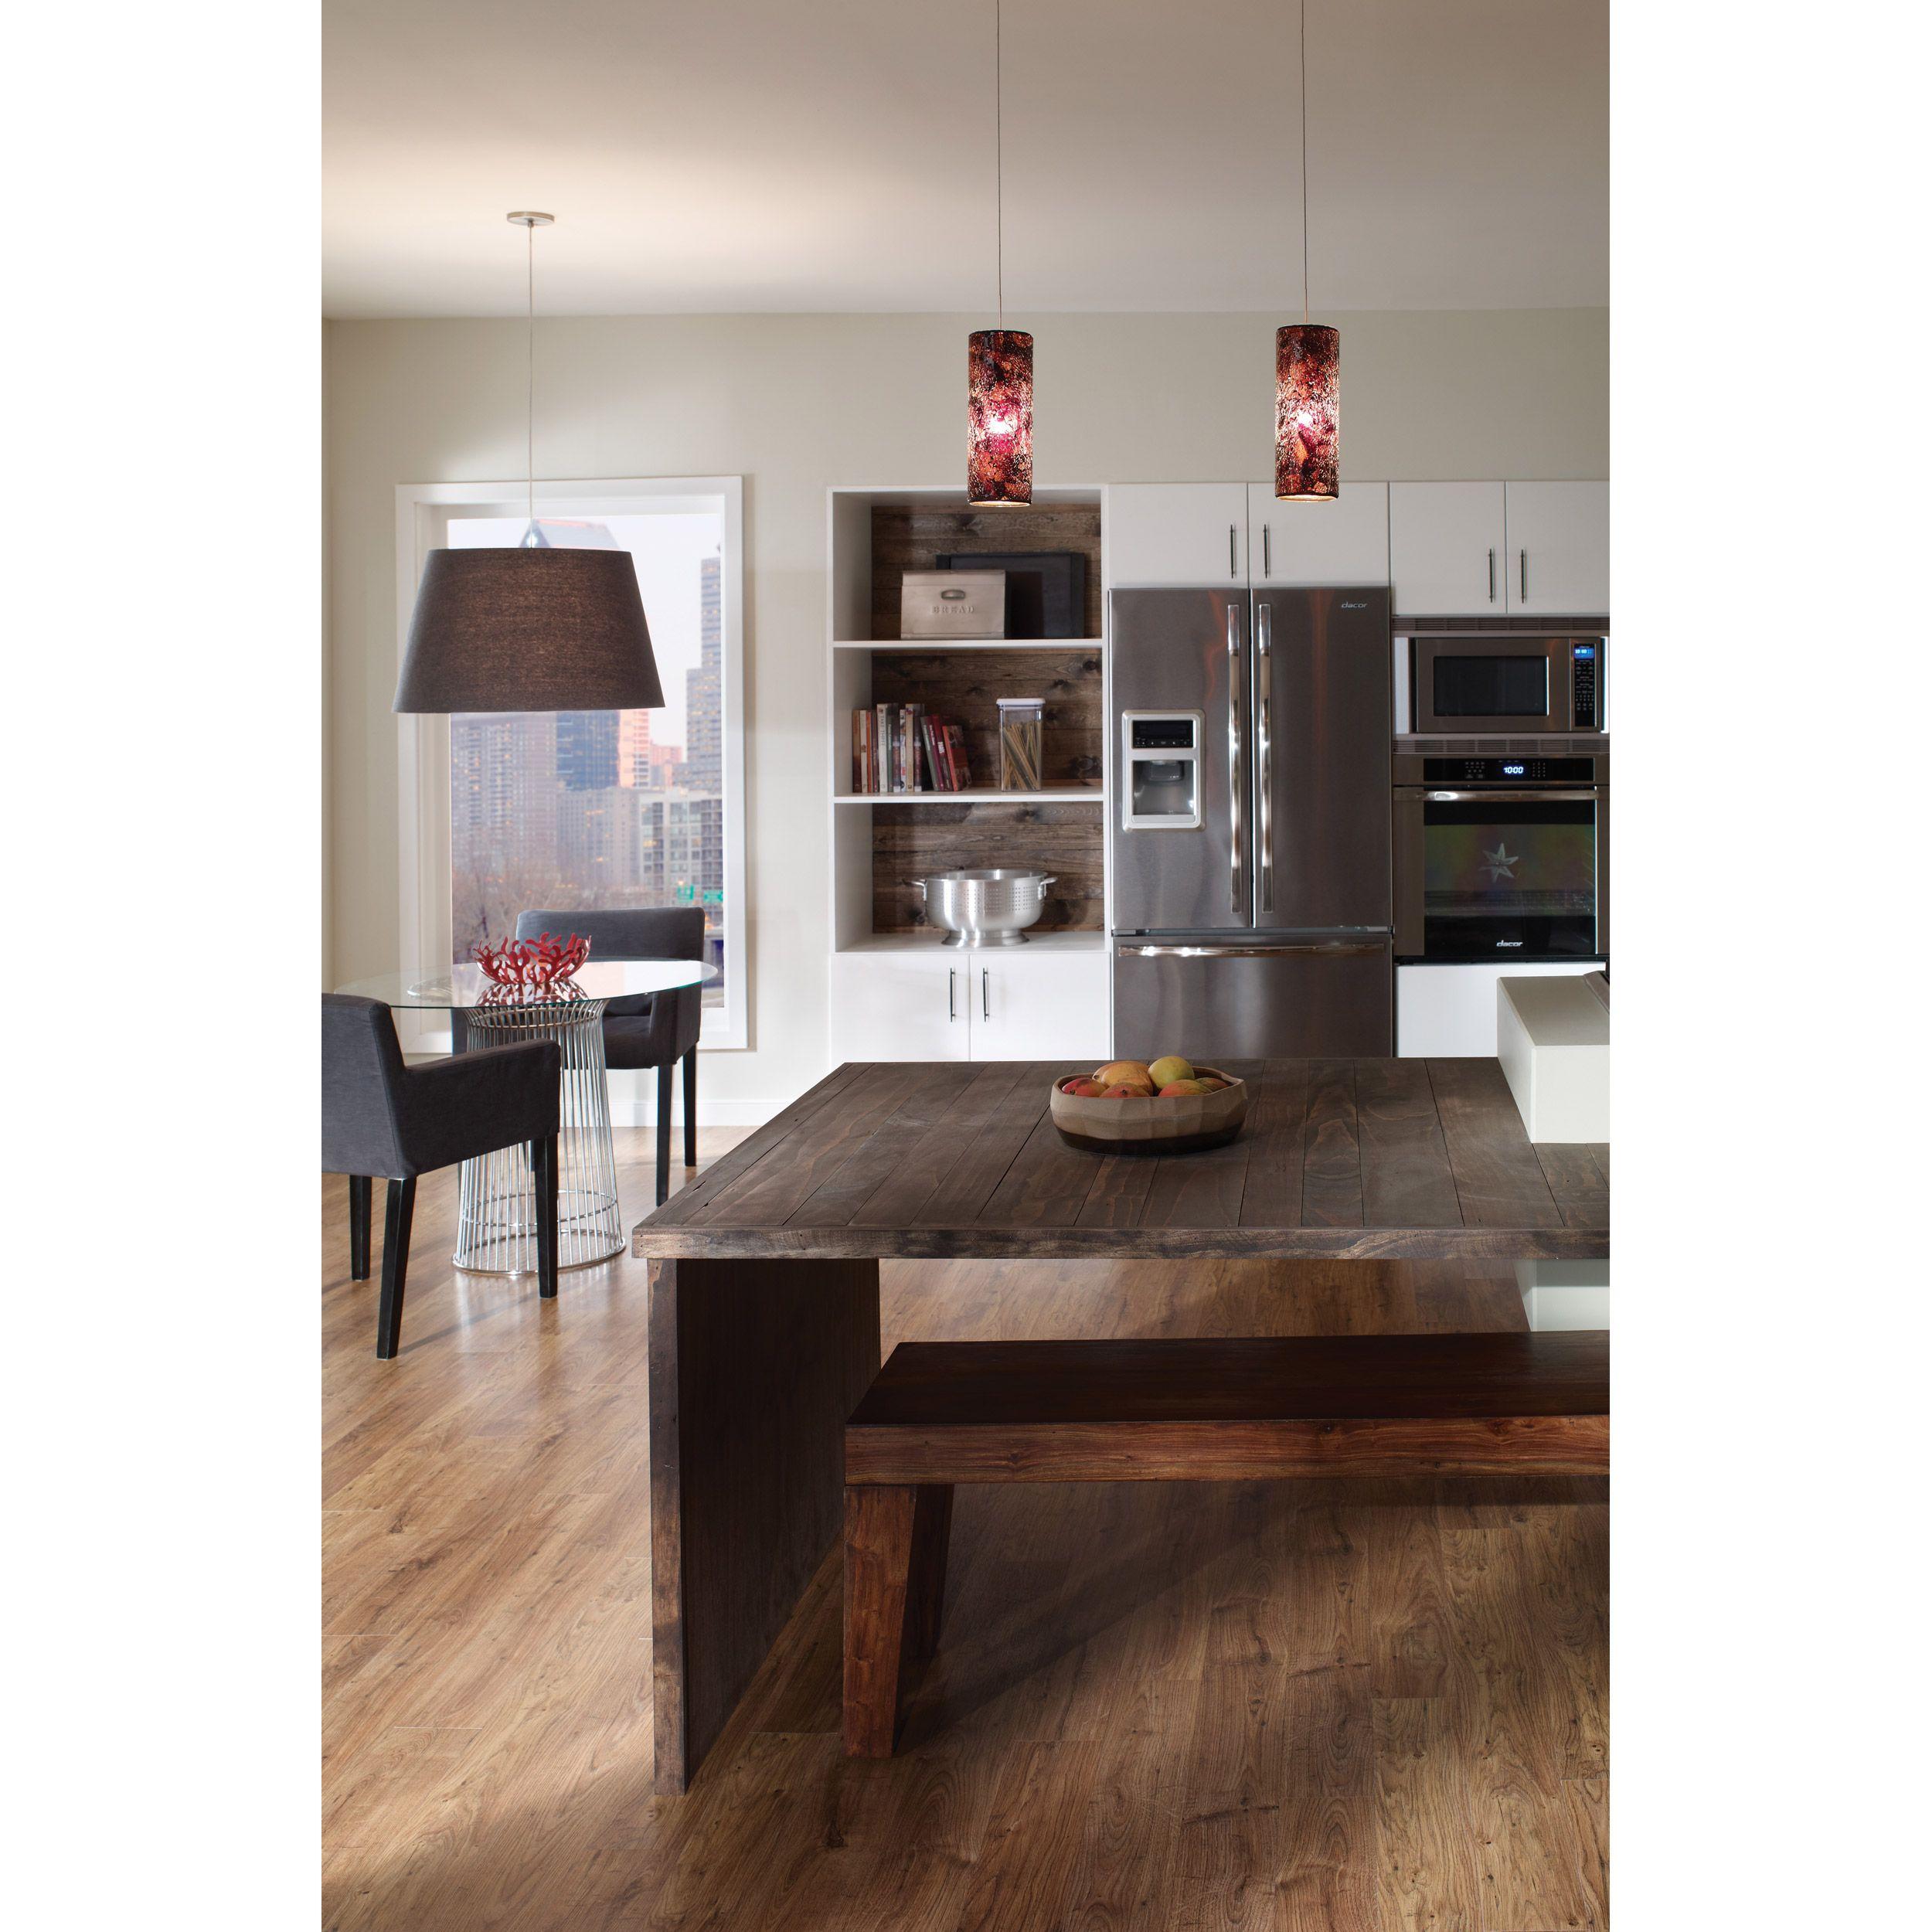 Tech Lighting LowVoltage Veil Pendant Small kitchen